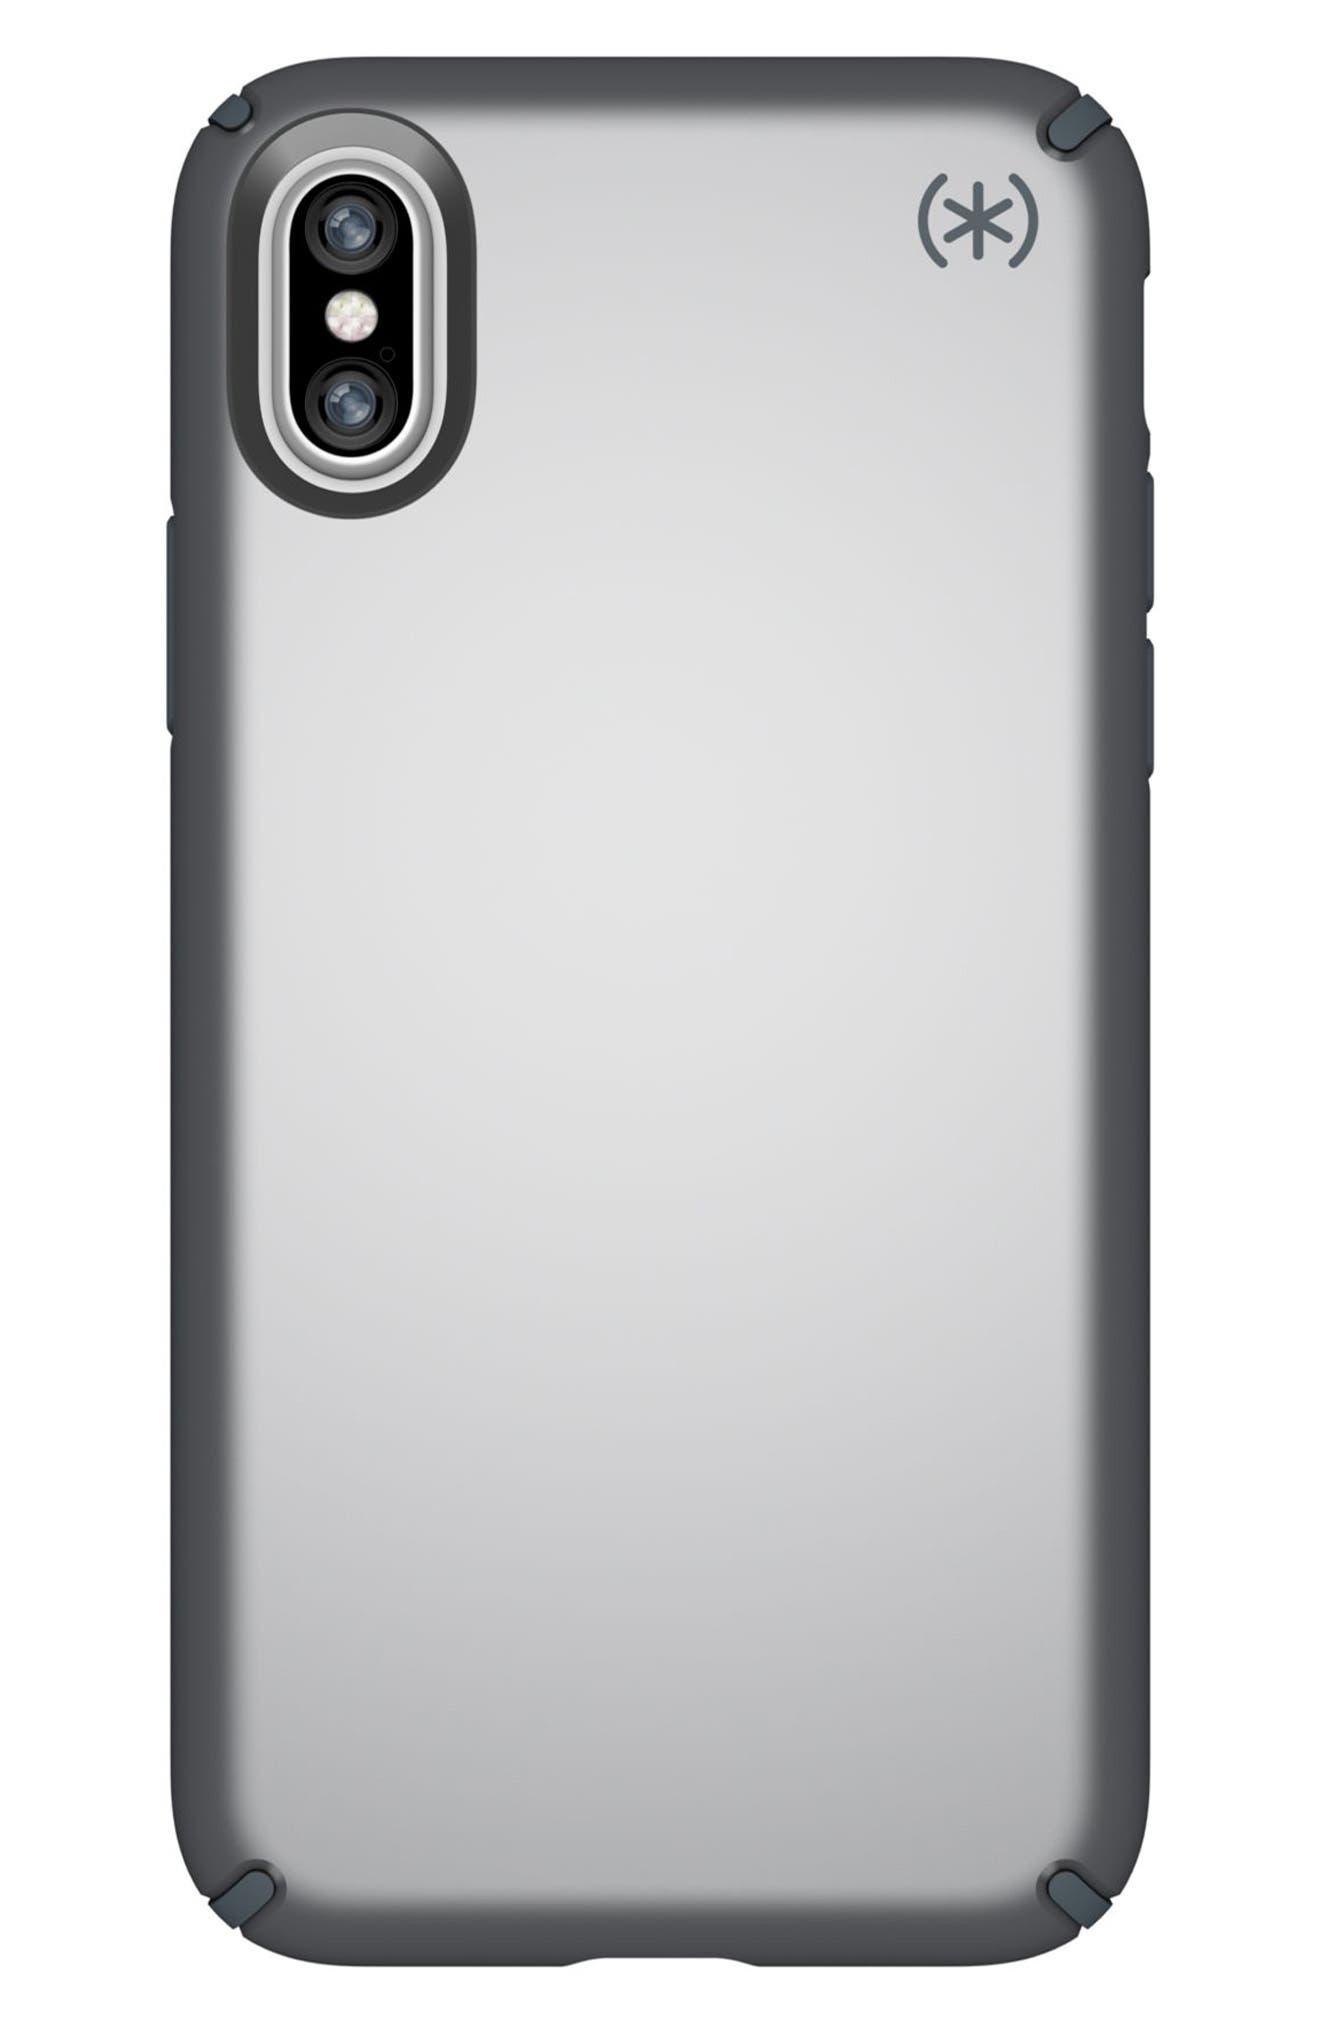 iPhone X Case,                         Main,                         color, Tungsten Grey Metallic/ Grey